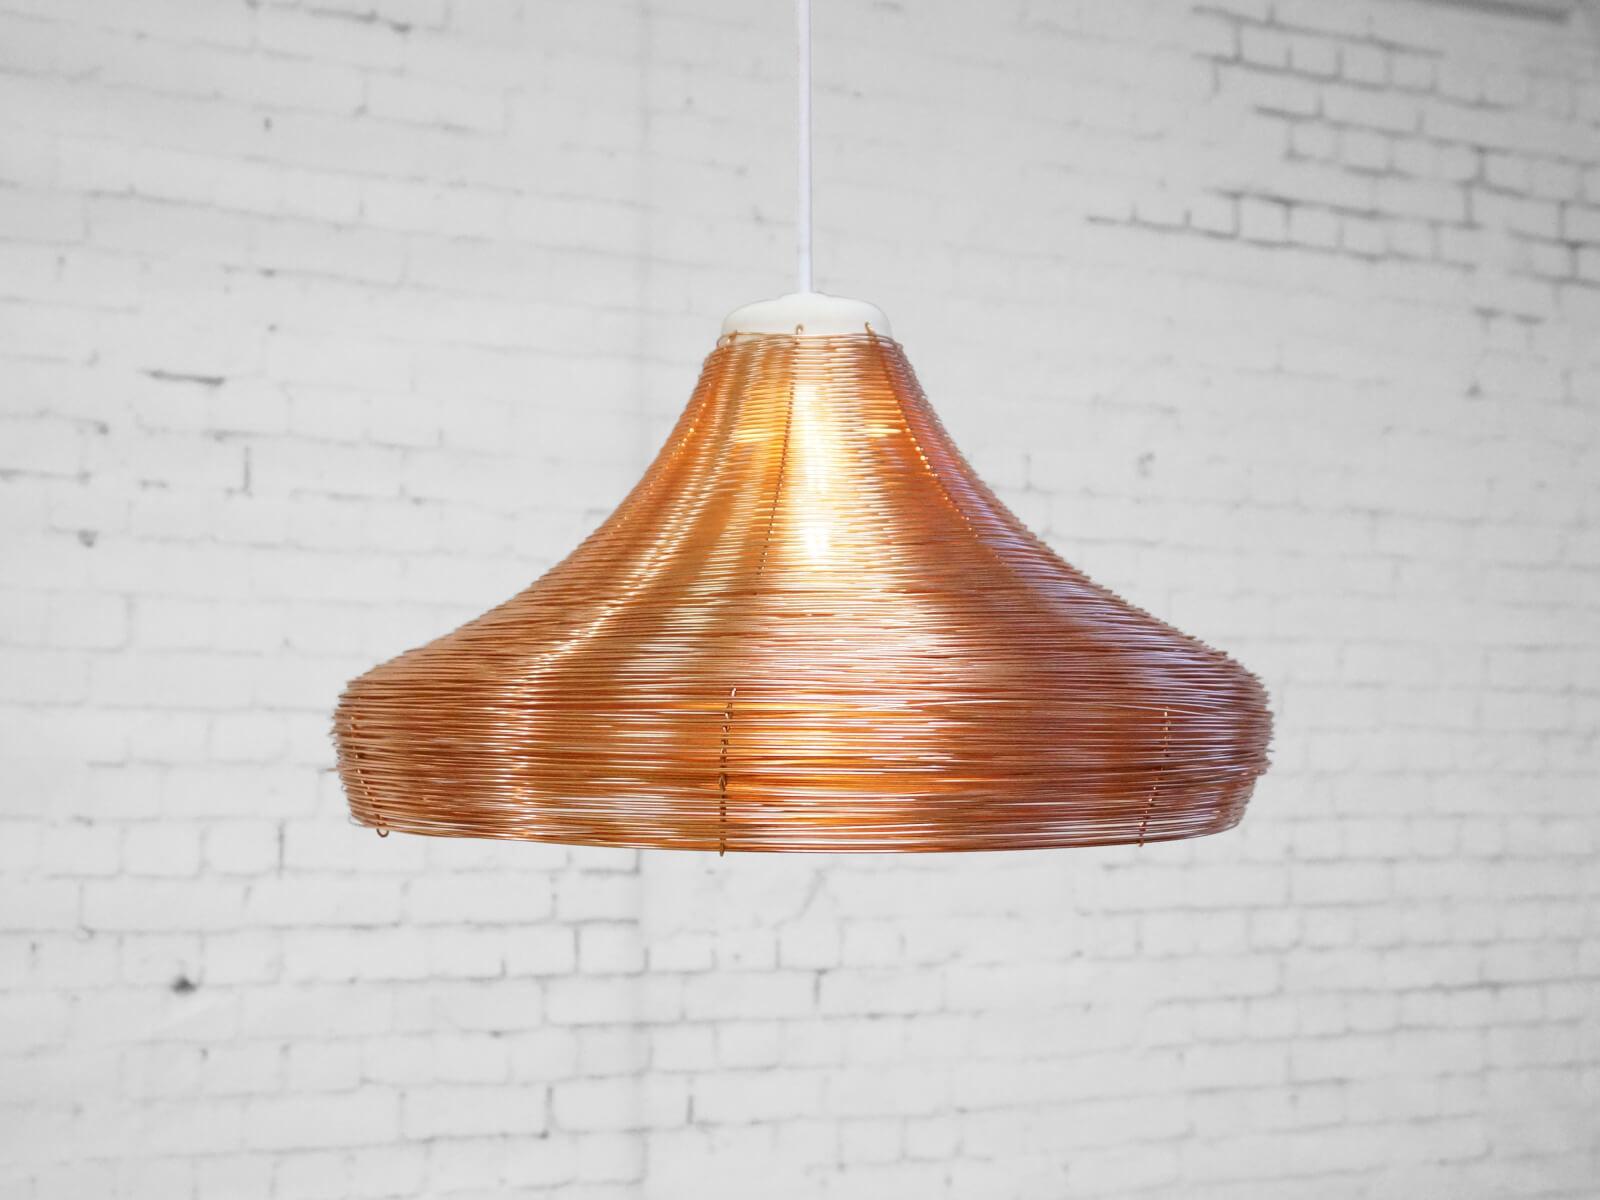 Woven Wire Lamp - Car-essay